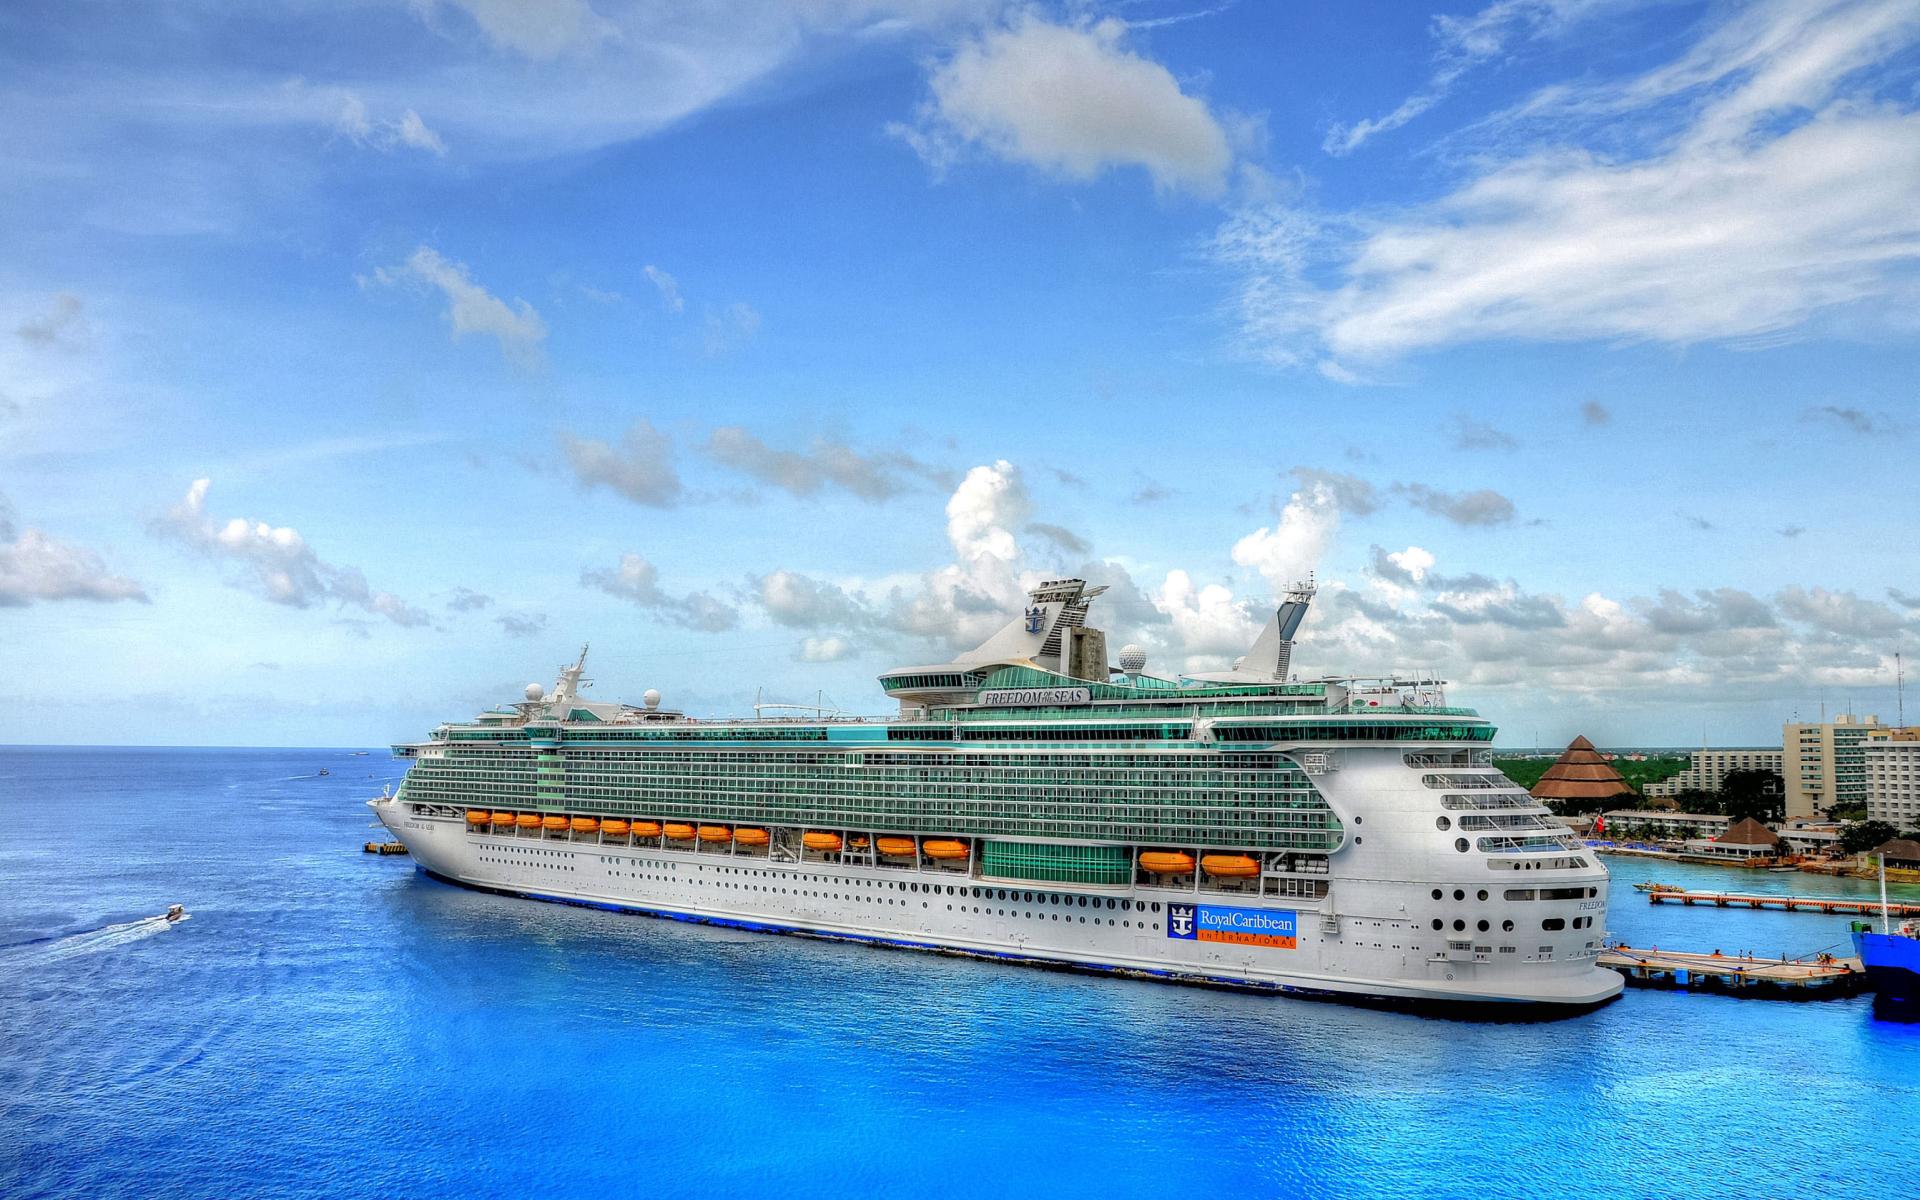 Royal Caribbean Cruise Wallpaper for Widescreen Desktop PC 1920x1080 1920x1200